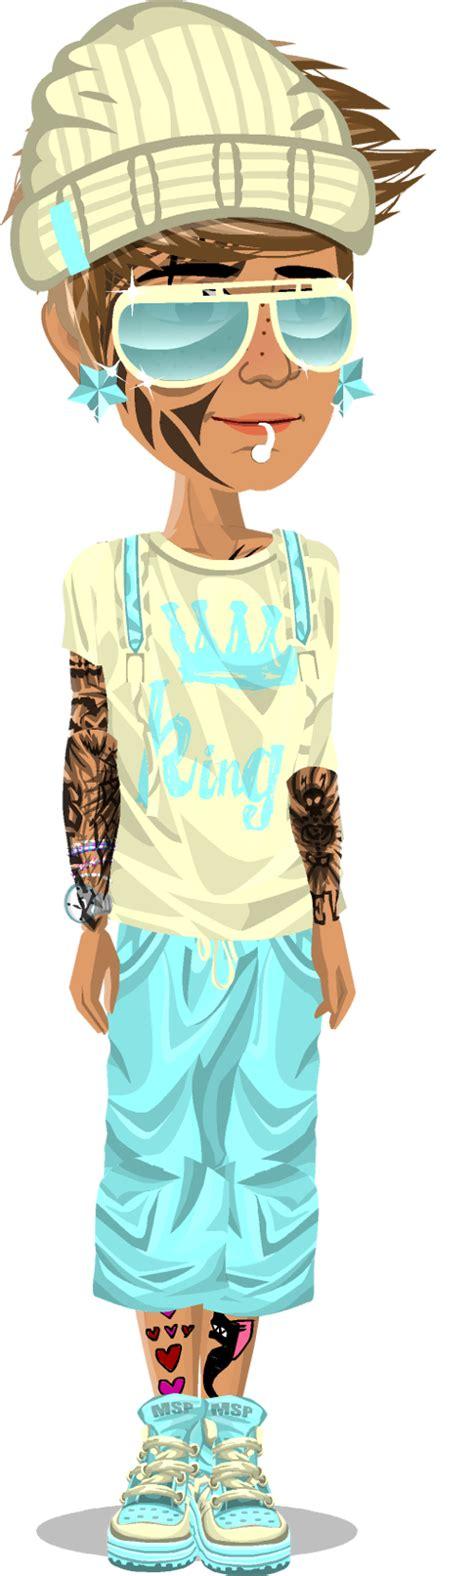 cute msp boy outfits meet friends 4ever msp myfirstworld